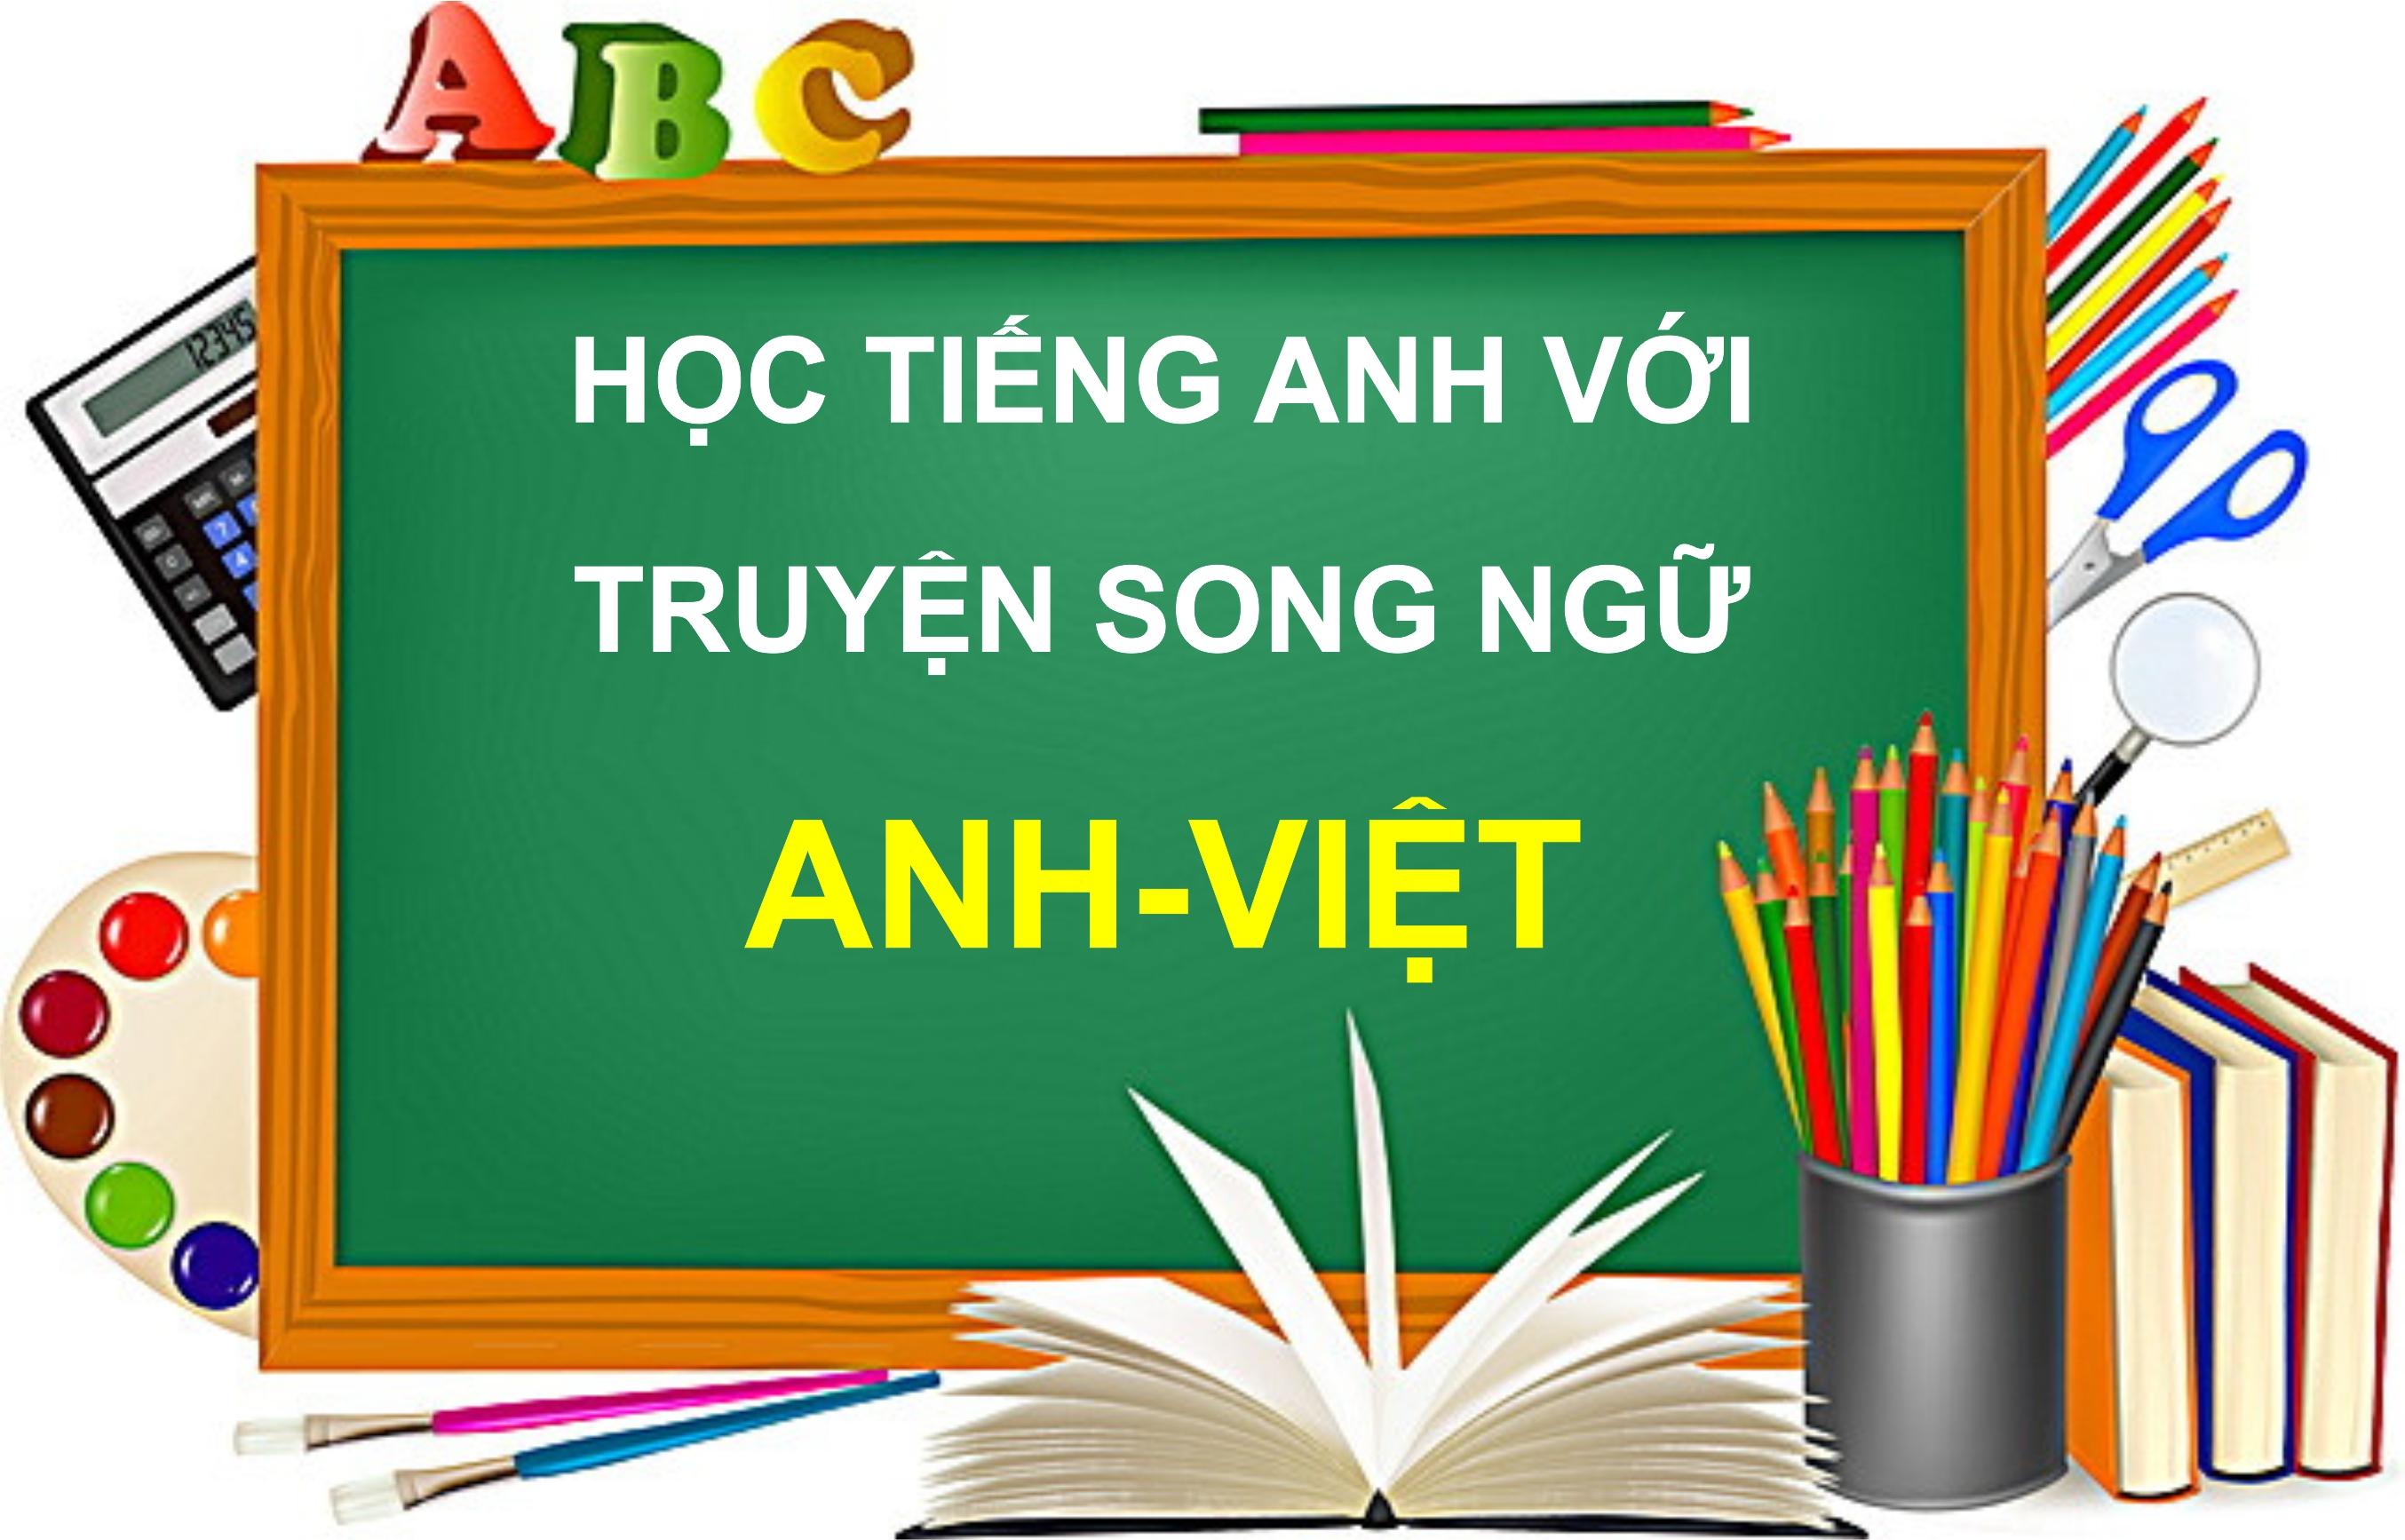 hoc-tieng-anh-voi-truyen-song-ngu-anh-viet-203